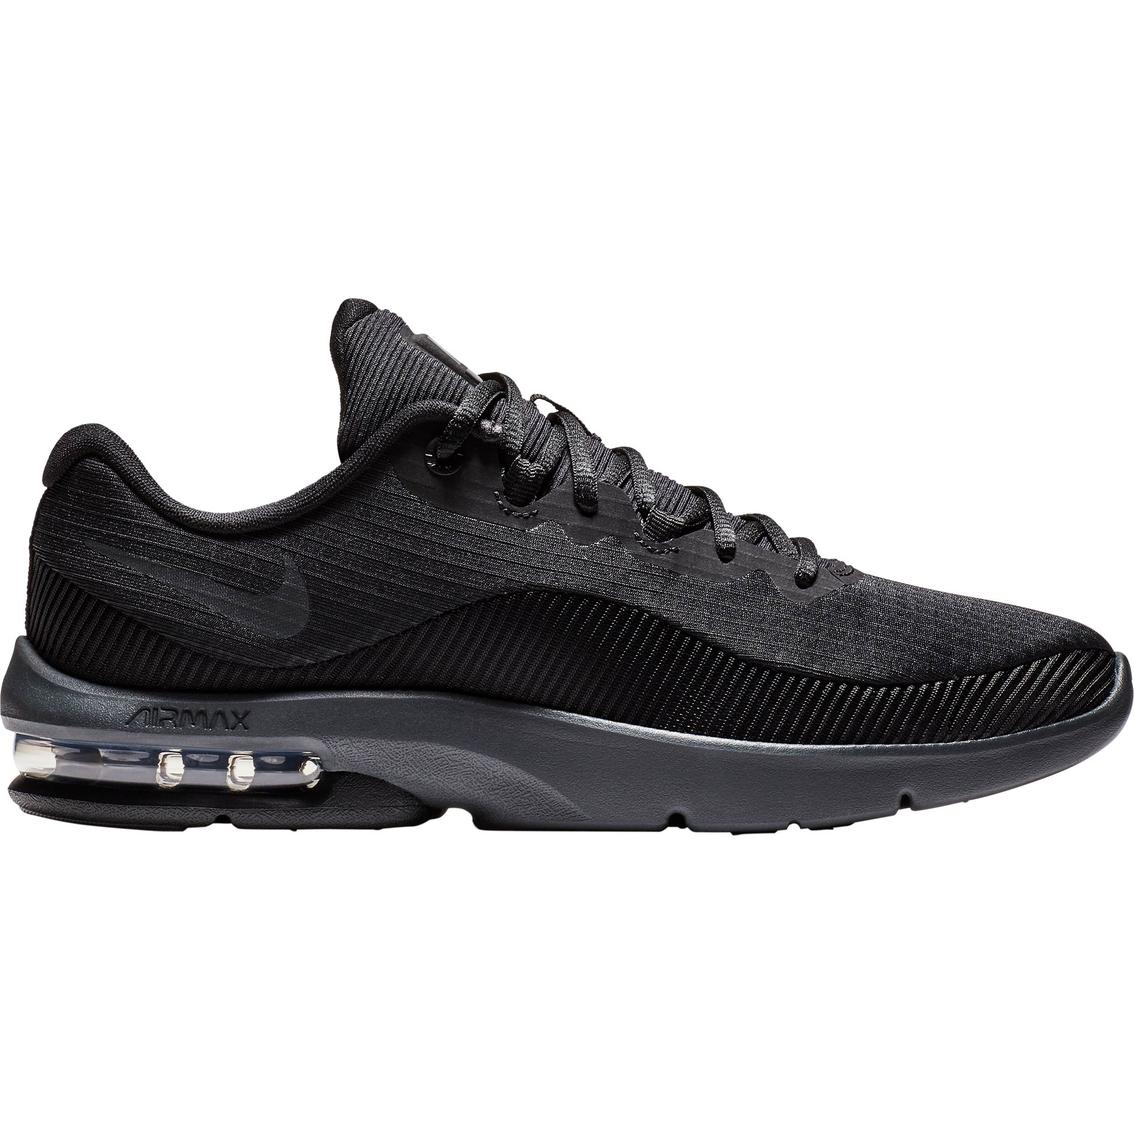 ea0e886811b063 Nike Men s Air Max Advantage 2 Running Shoes